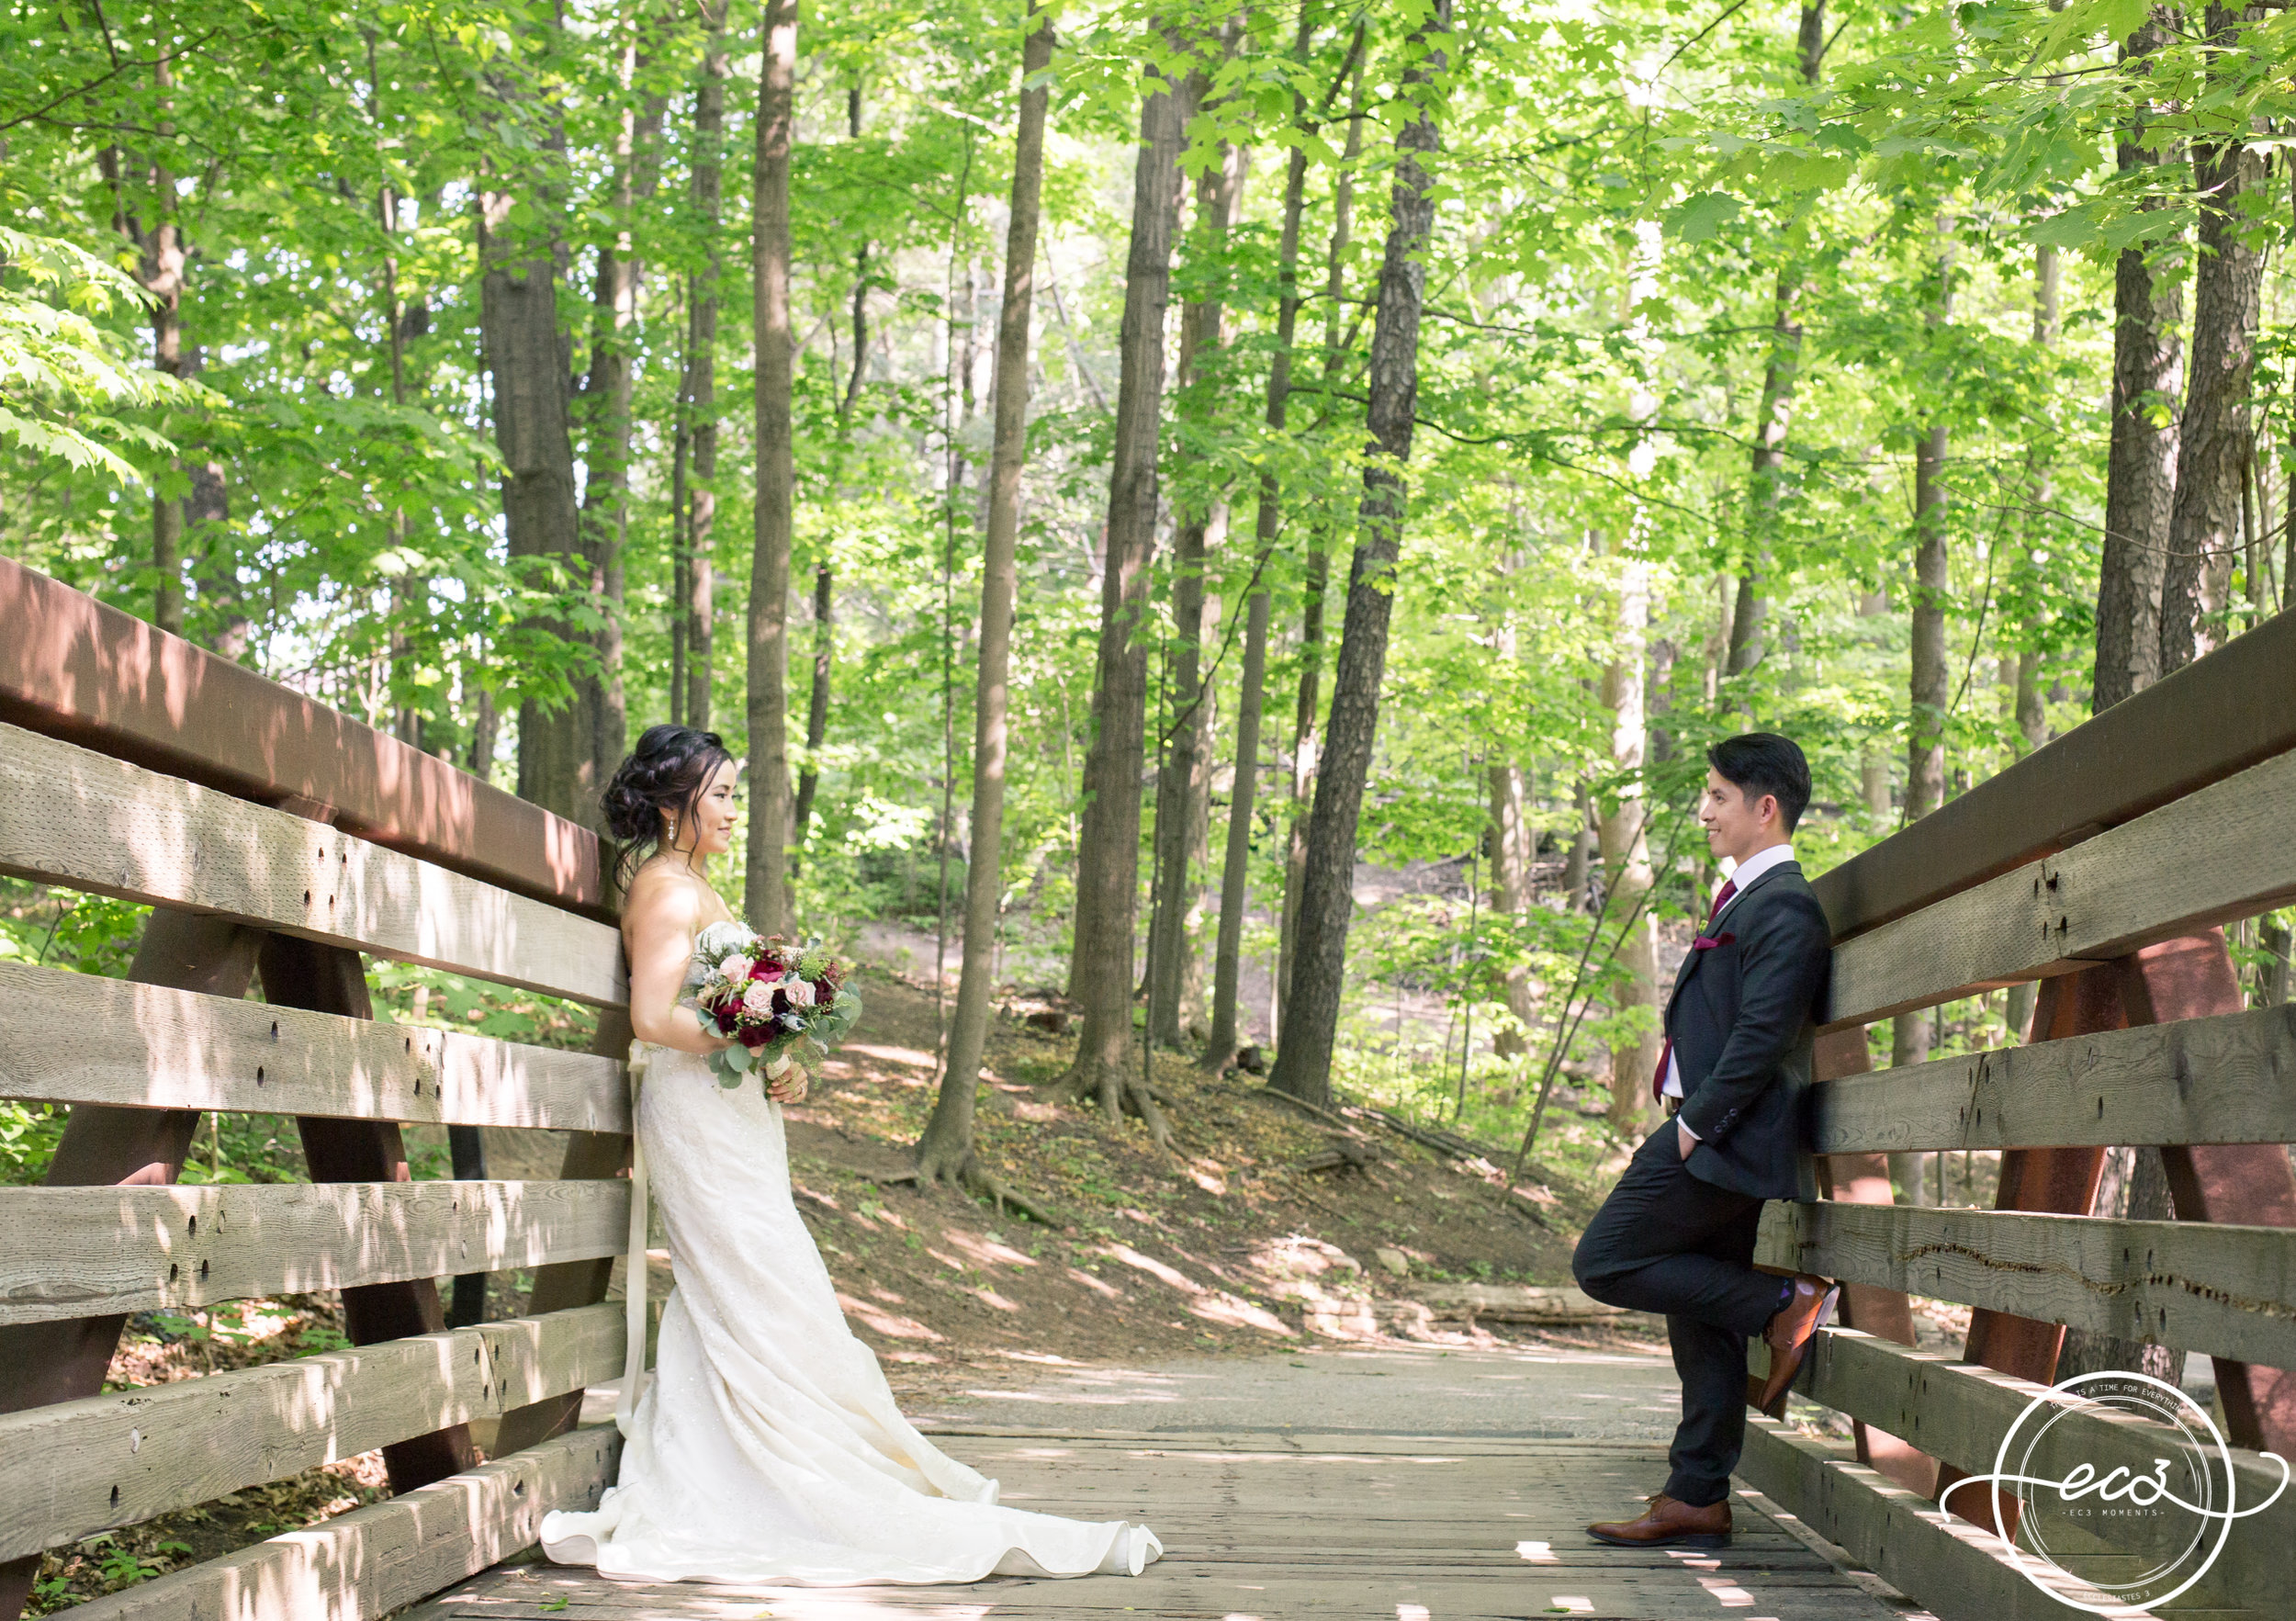 Toronto Edwards Garden and Intimate Vietnamese Wedding22.jpg